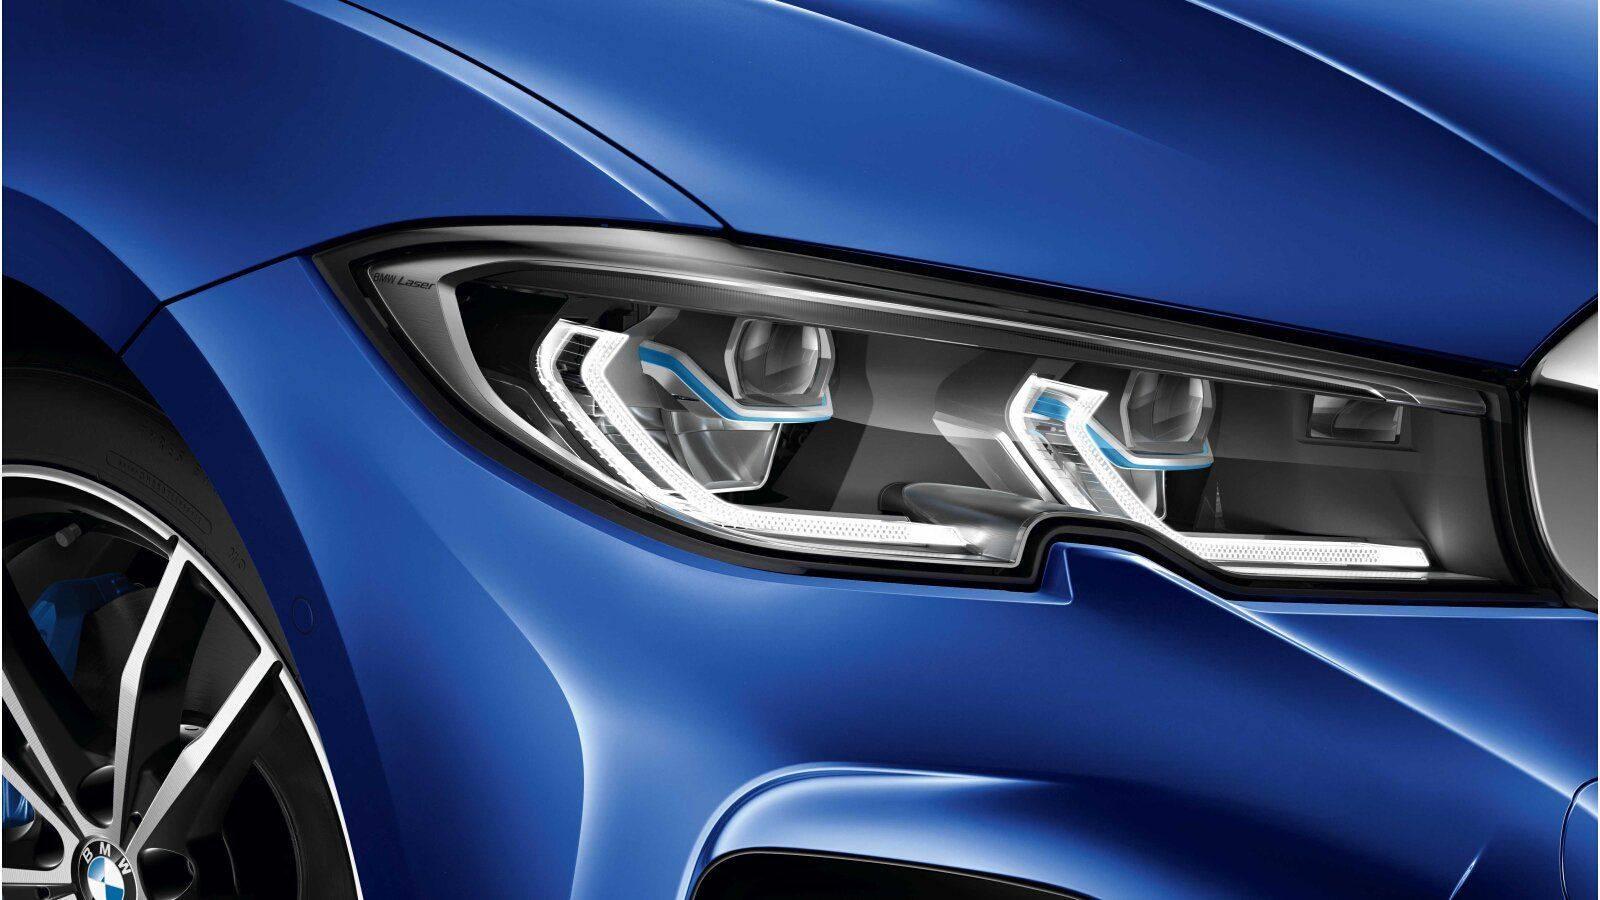 2019 BMW 3 Series G20 - Headlight